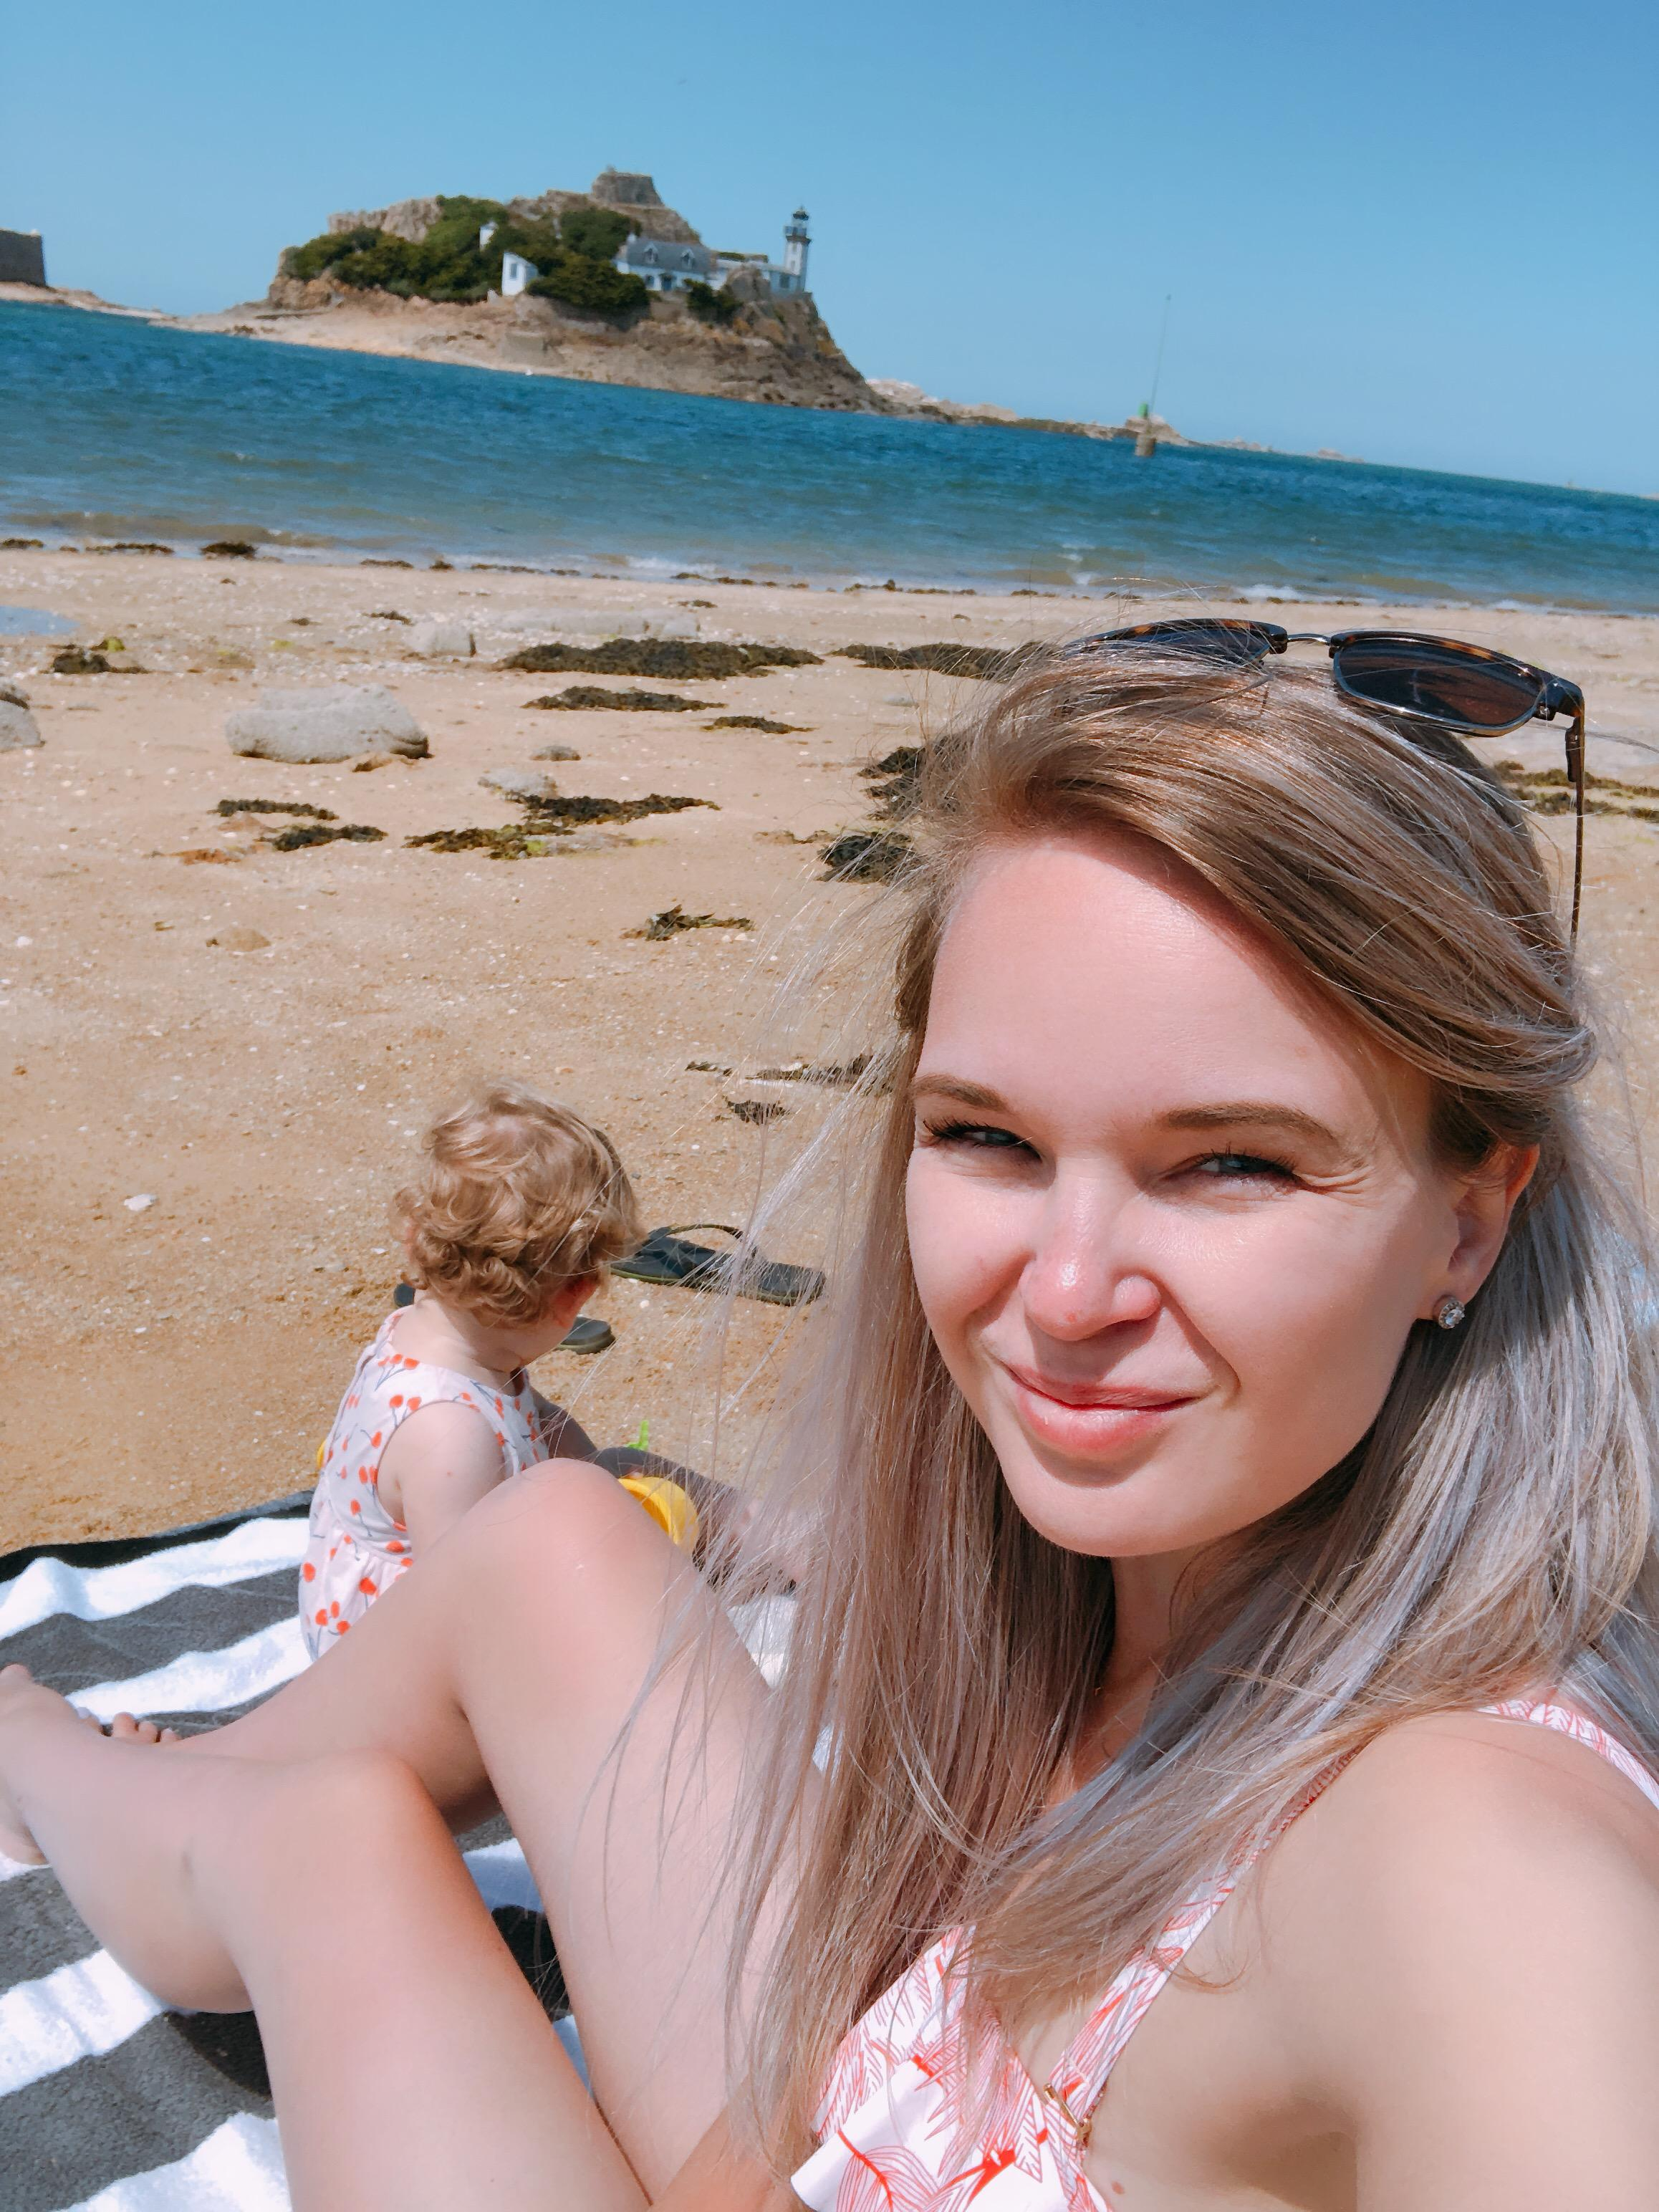 IMG 9868 2316x3088 - Fotodagboek Vakantie: Camping Les Mouettes, Bretagne!